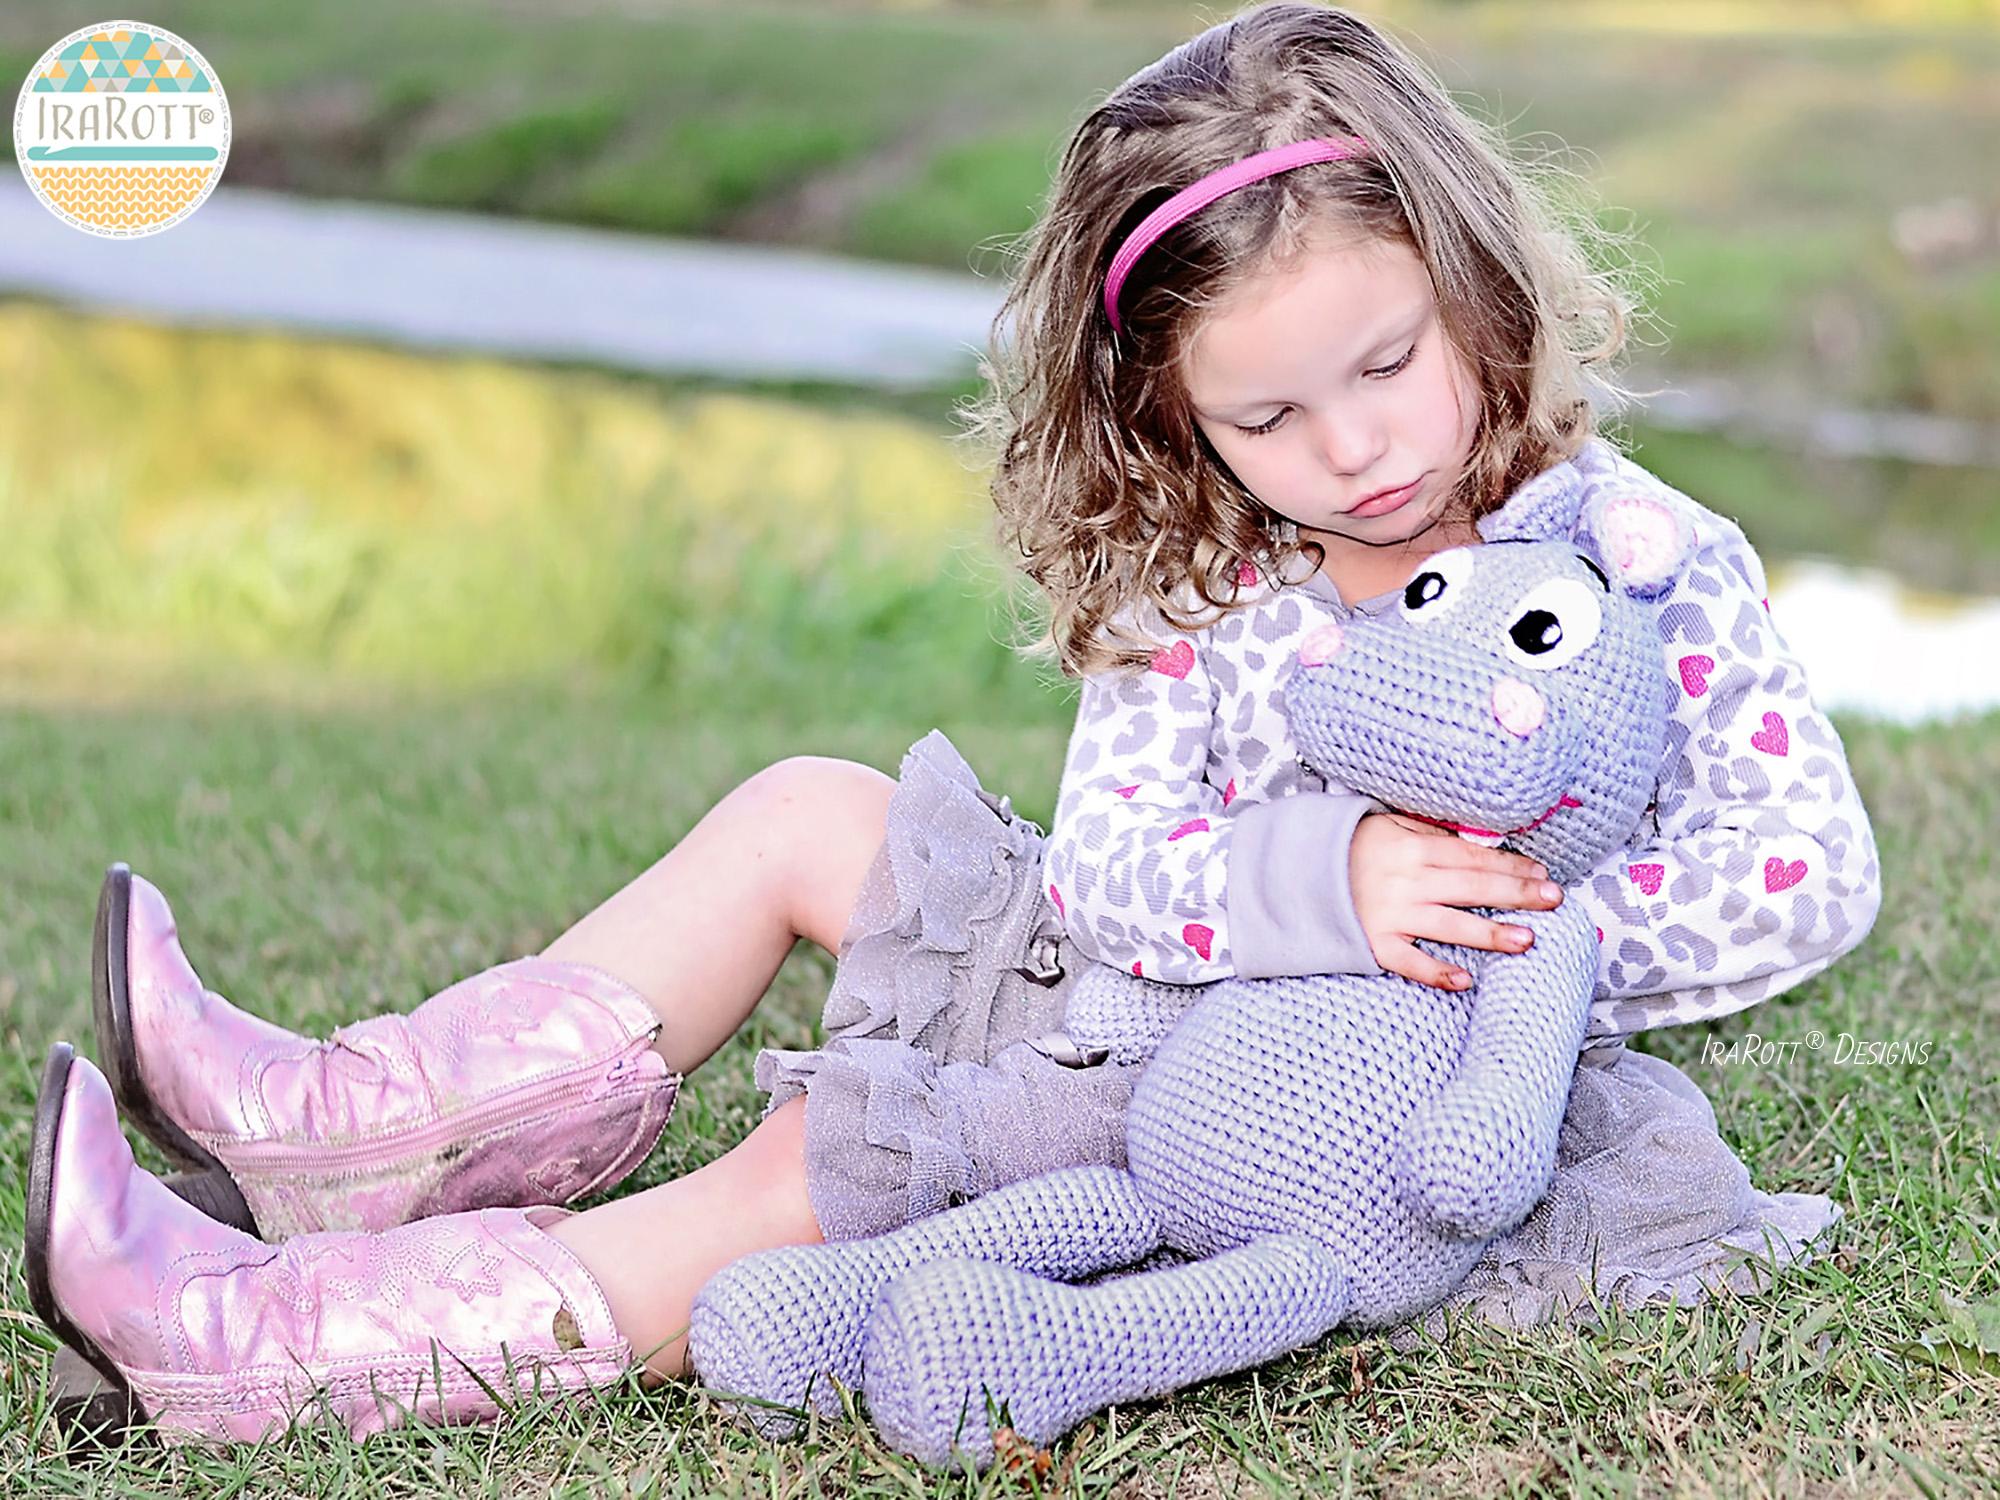 Easy Amigurumi Pdf : Happy hippo the hippopotamus amigurumi toy stuffed animal pdf